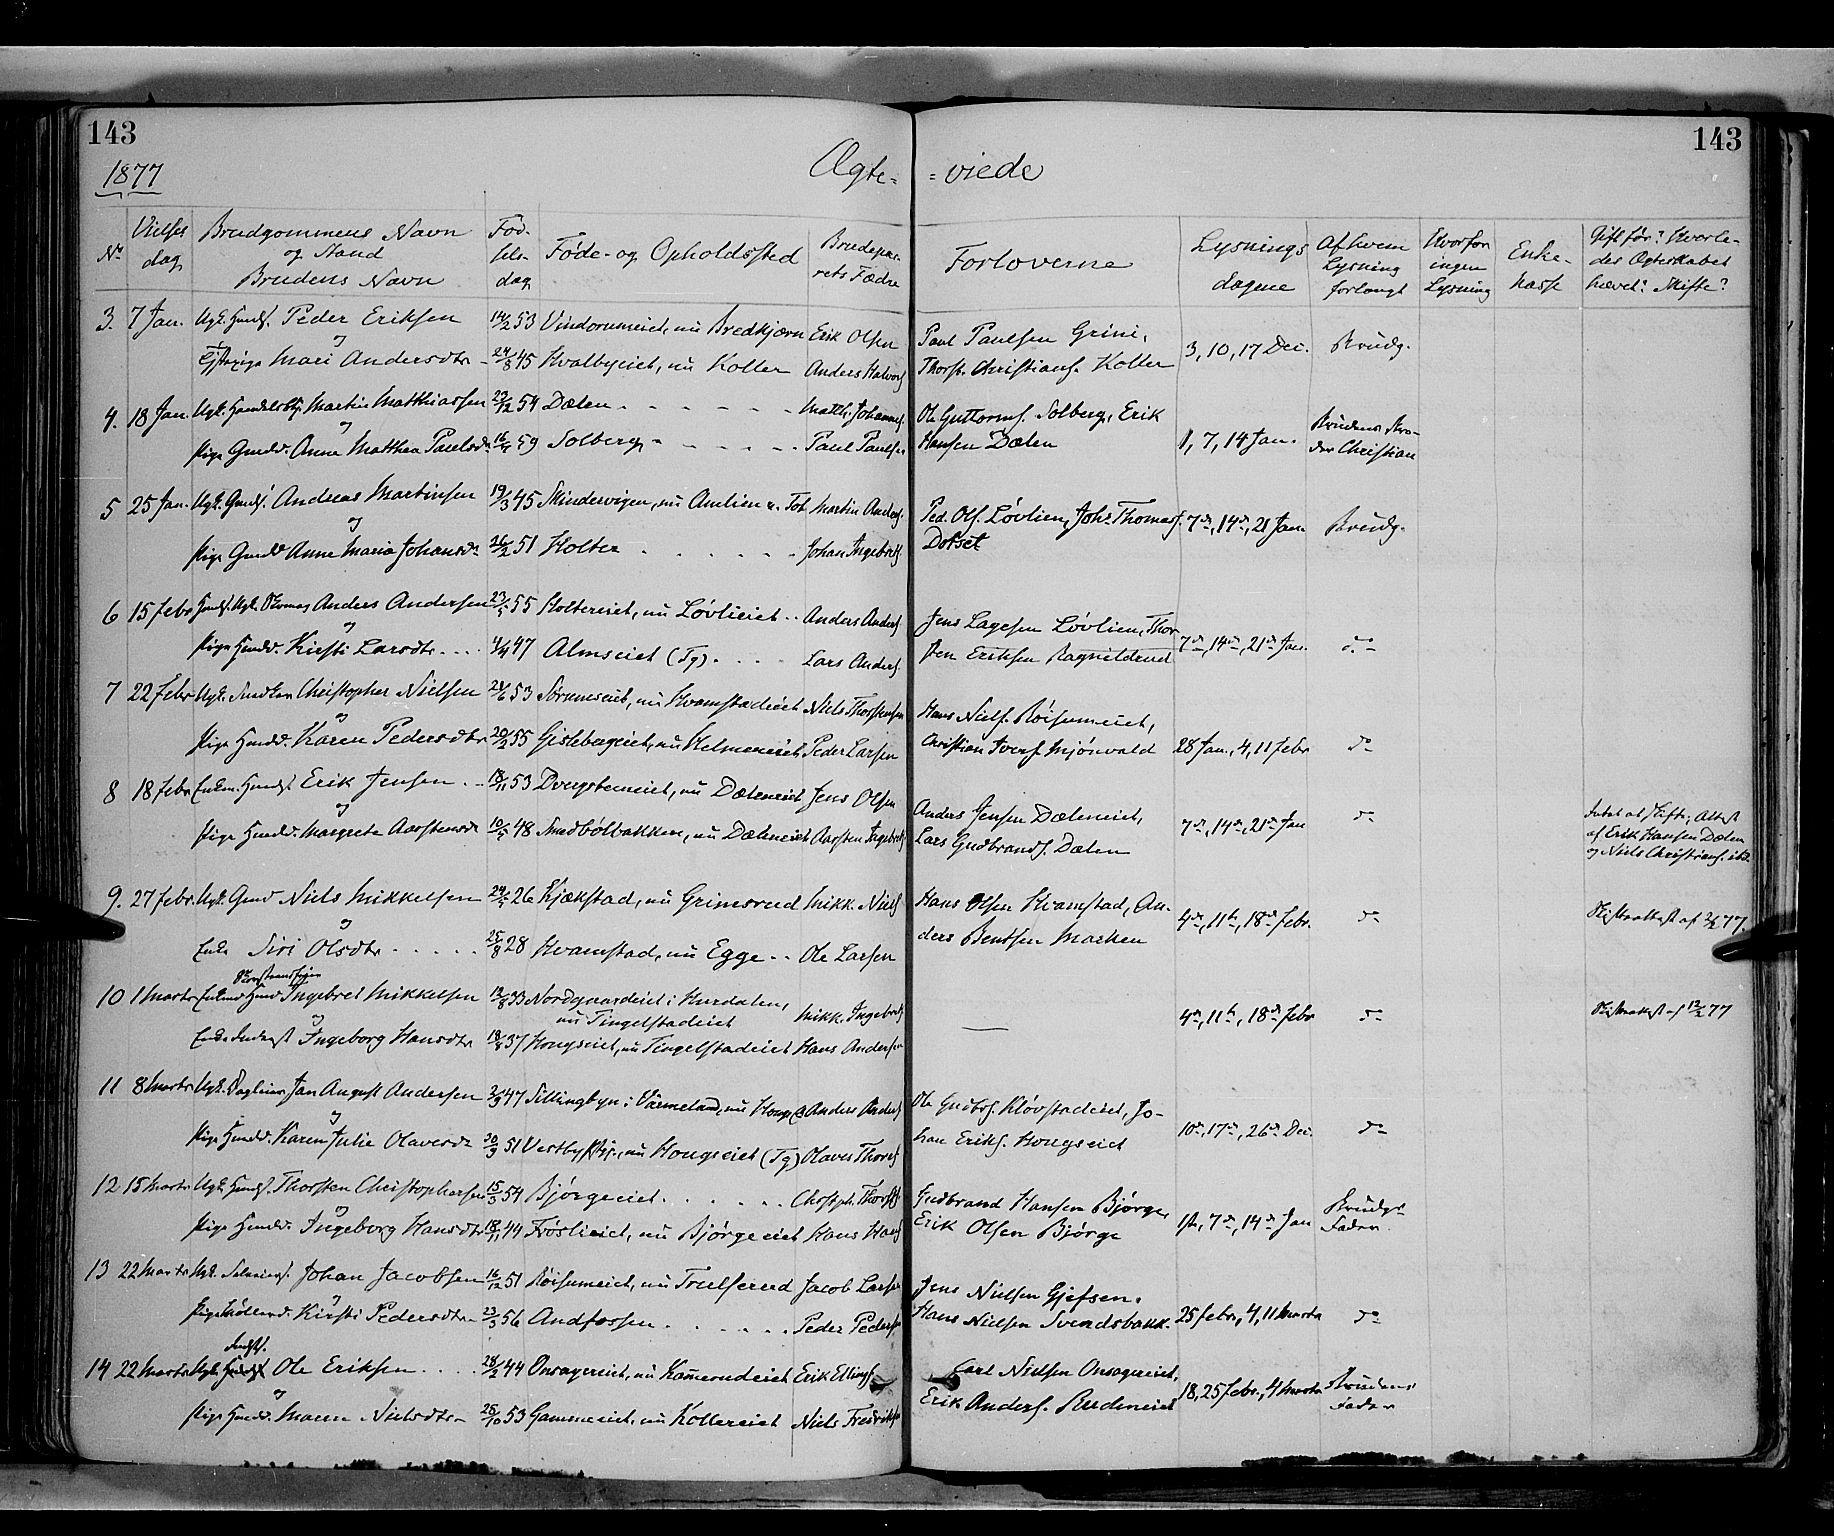 SAH, Gran prestekontor, Ministerialbok nr. 13, 1875-1879, s. 143